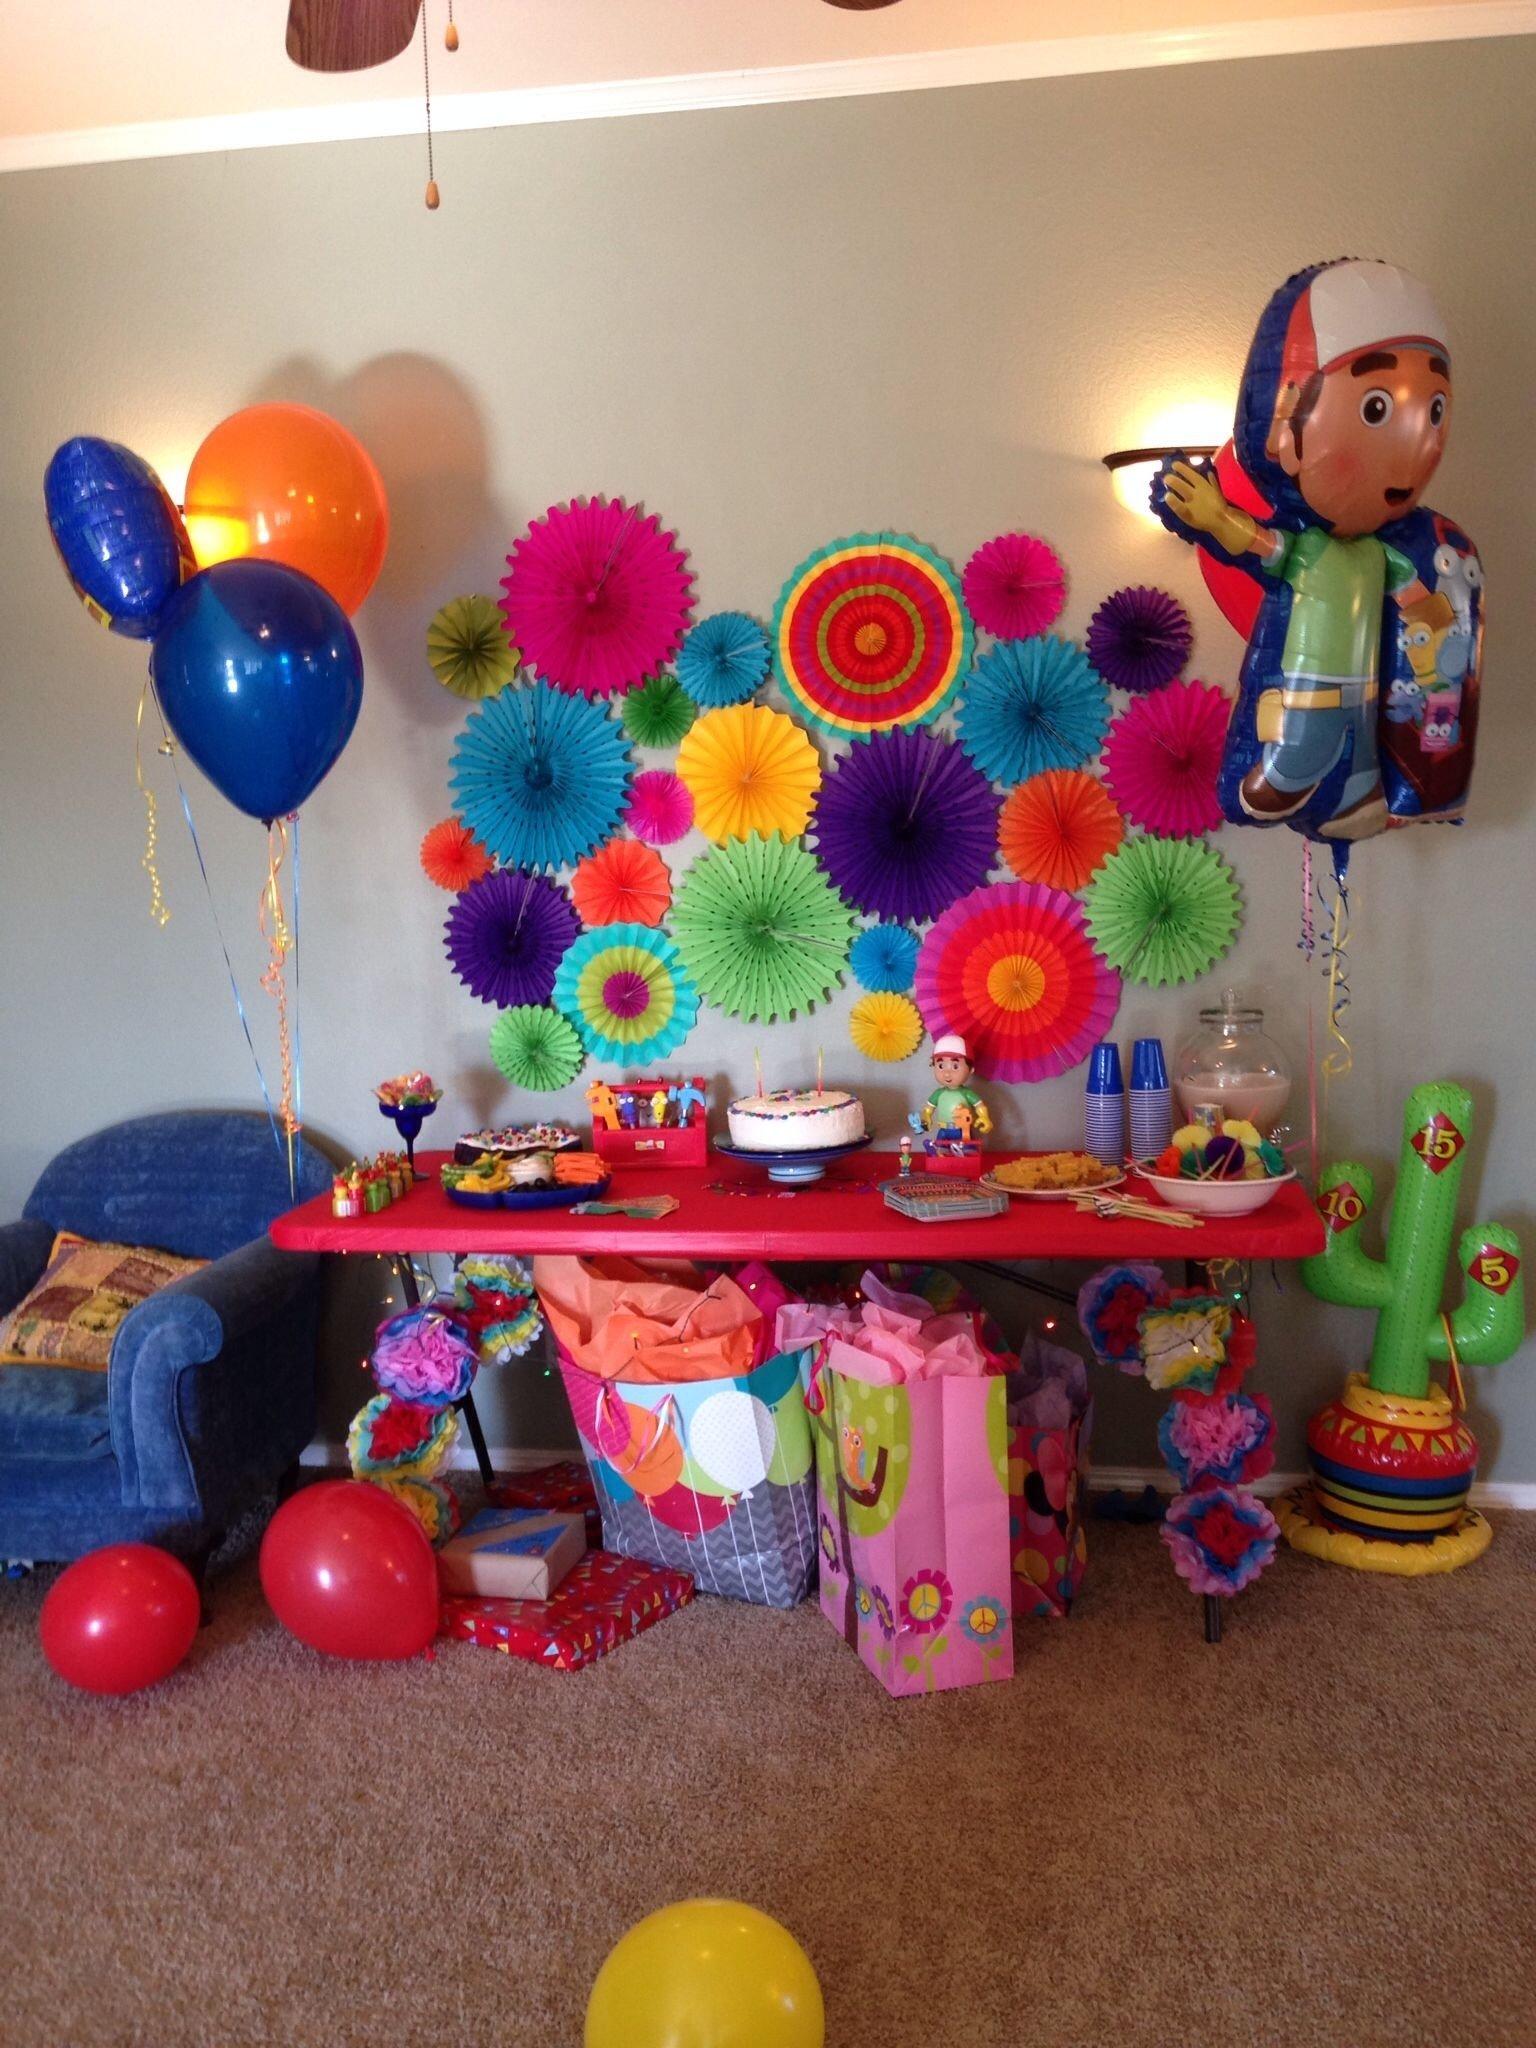 10 Amazing Handy Manny Birthday Party Ideas handy manny fiesta birthday party we like theme parties a lot 2020